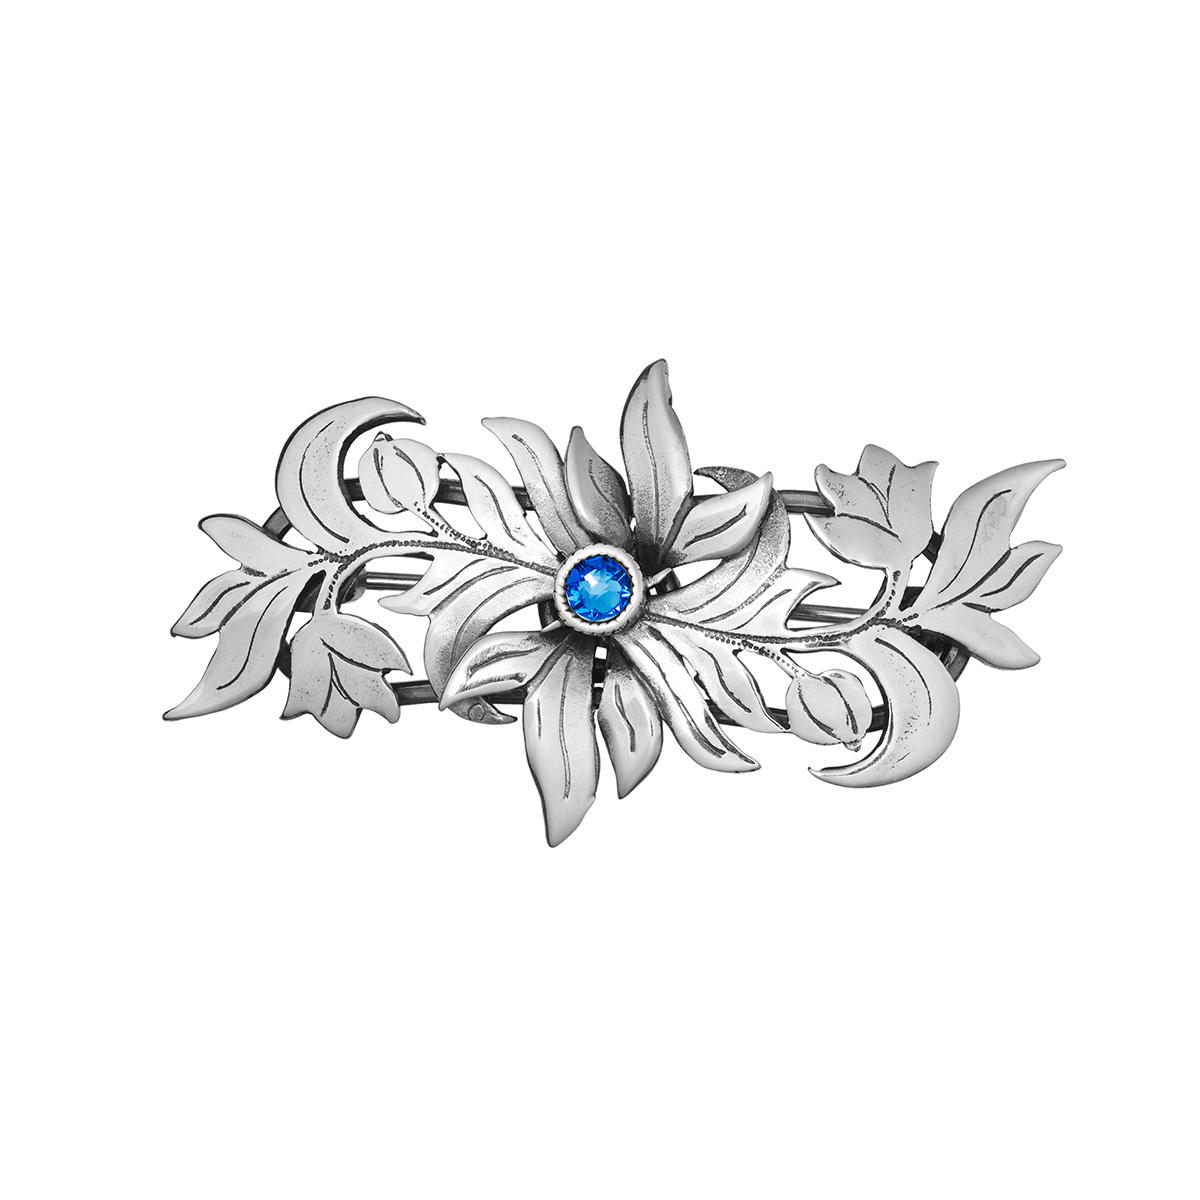 20016-2 - Barnebrosje Flora til Jubileumsdrakten, blå